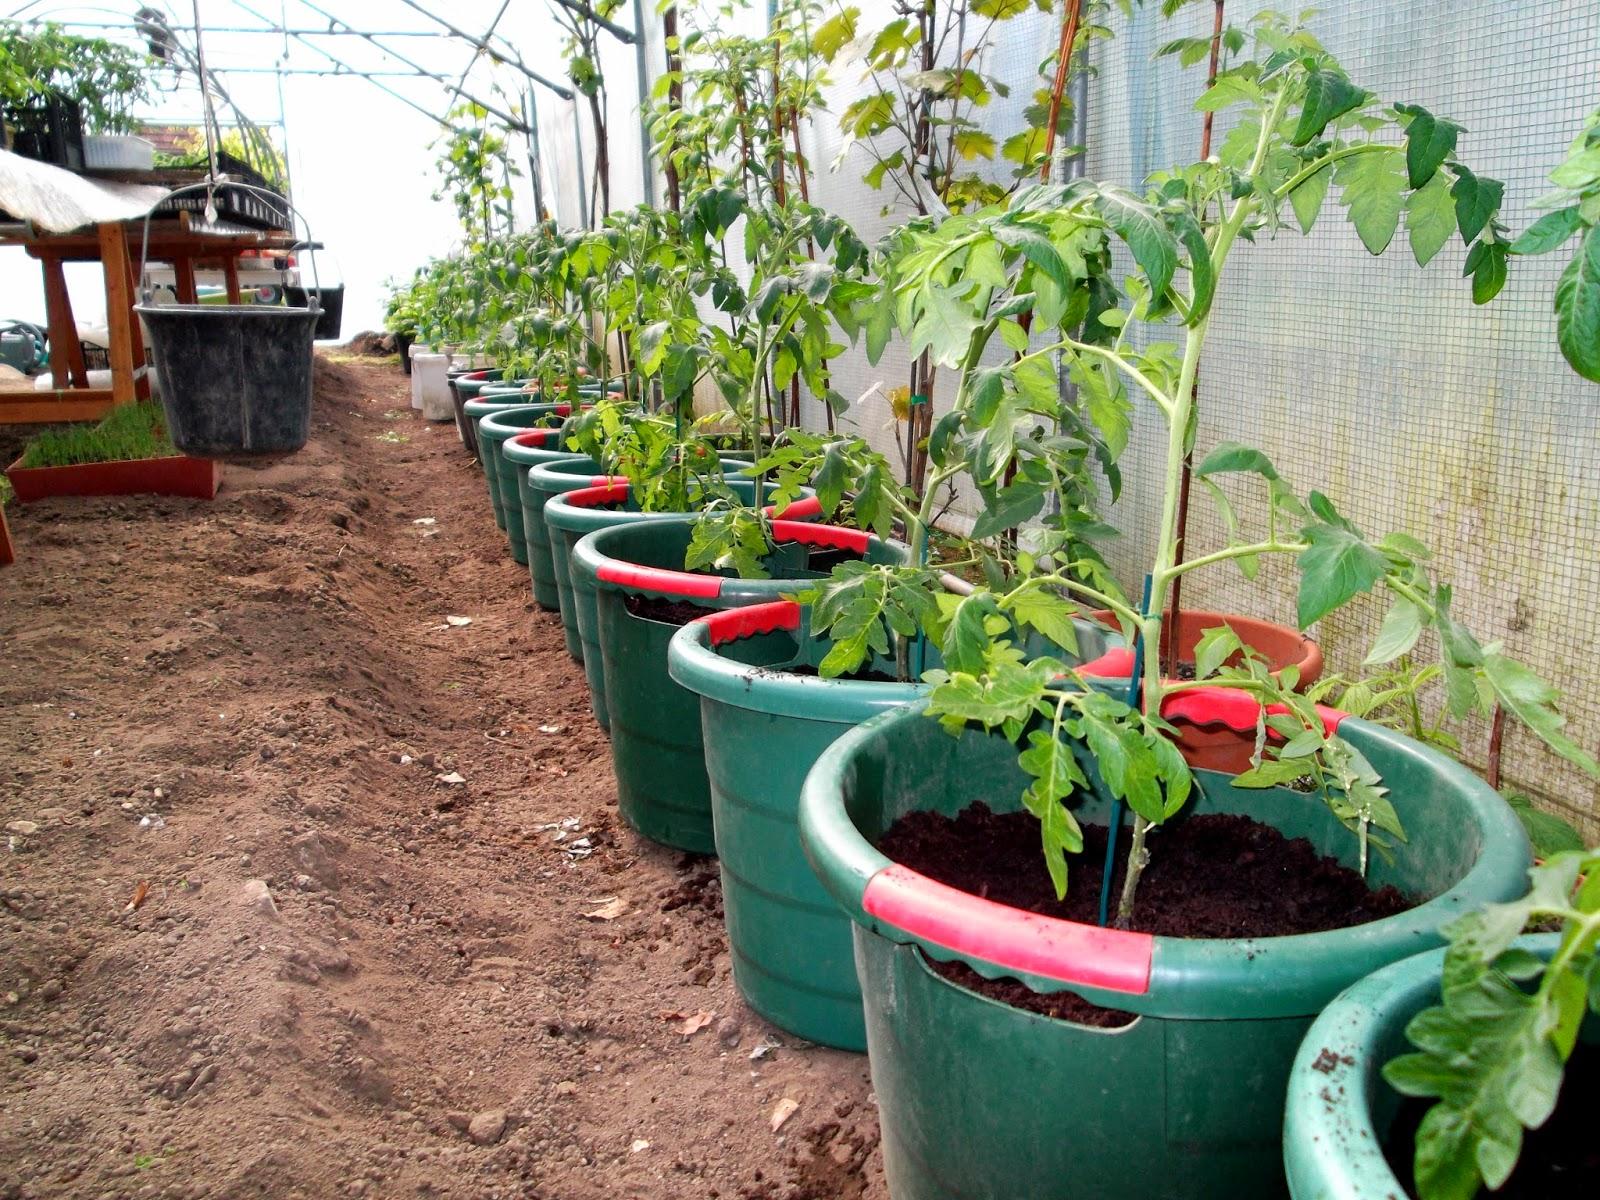 passion tomates tomates greffees en pot plantees ce jour. Black Bedroom Furniture Sets. Home Design Ideas